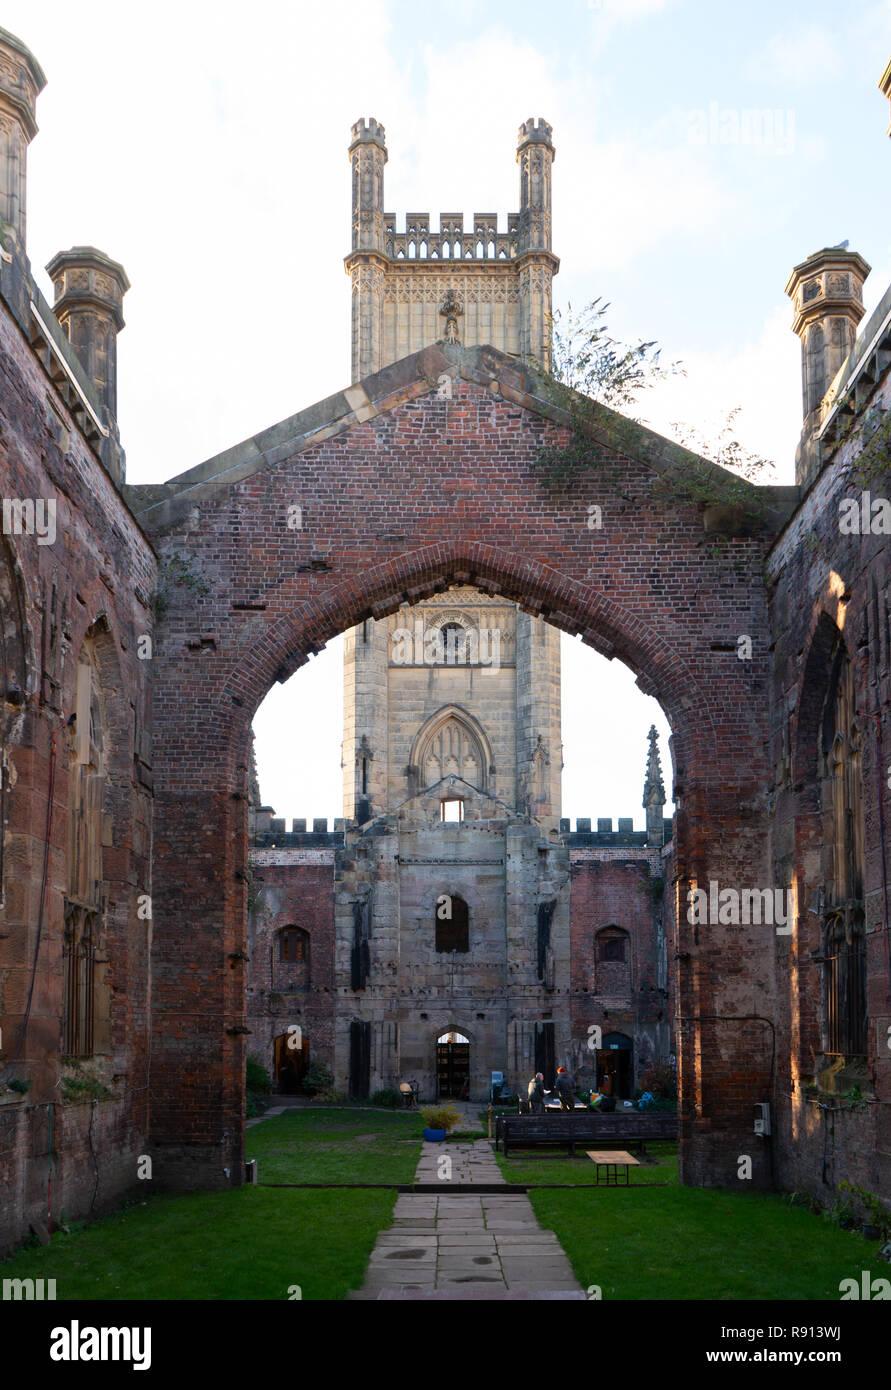 St Luke's Church, Leece Street, Liverpool. Bombed in the 1941 blitz, but the shell survives. Image taken in November 2018. - Stock Image